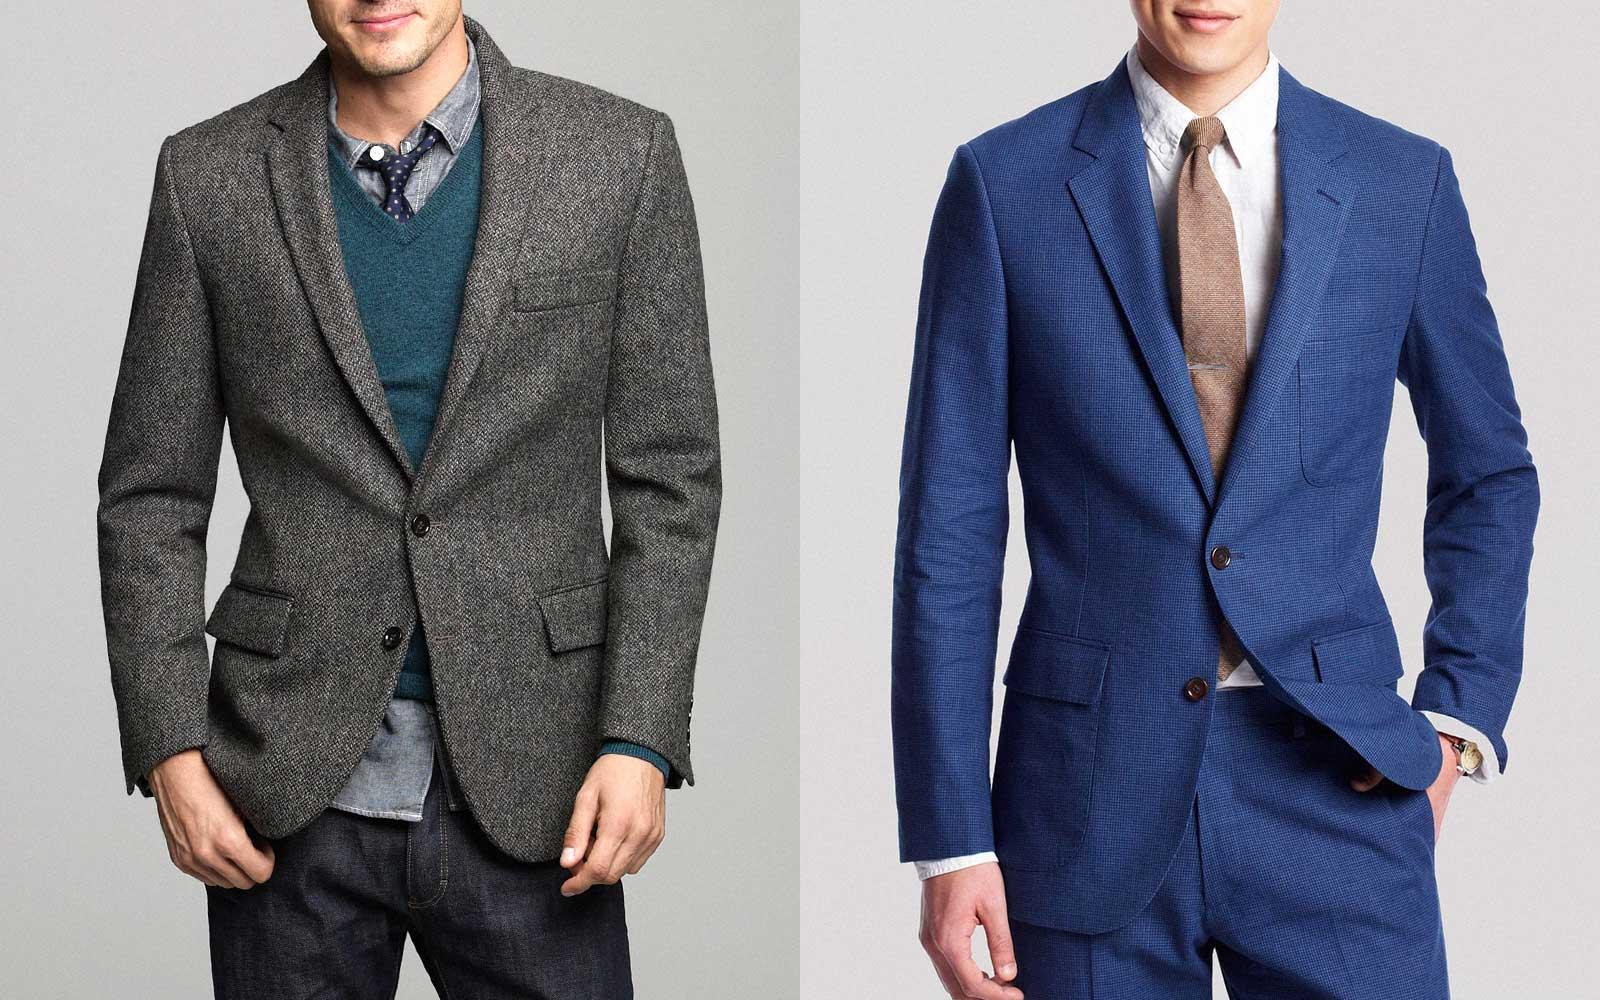 Sport Coat vs. Blazer vs. Suit Jacket